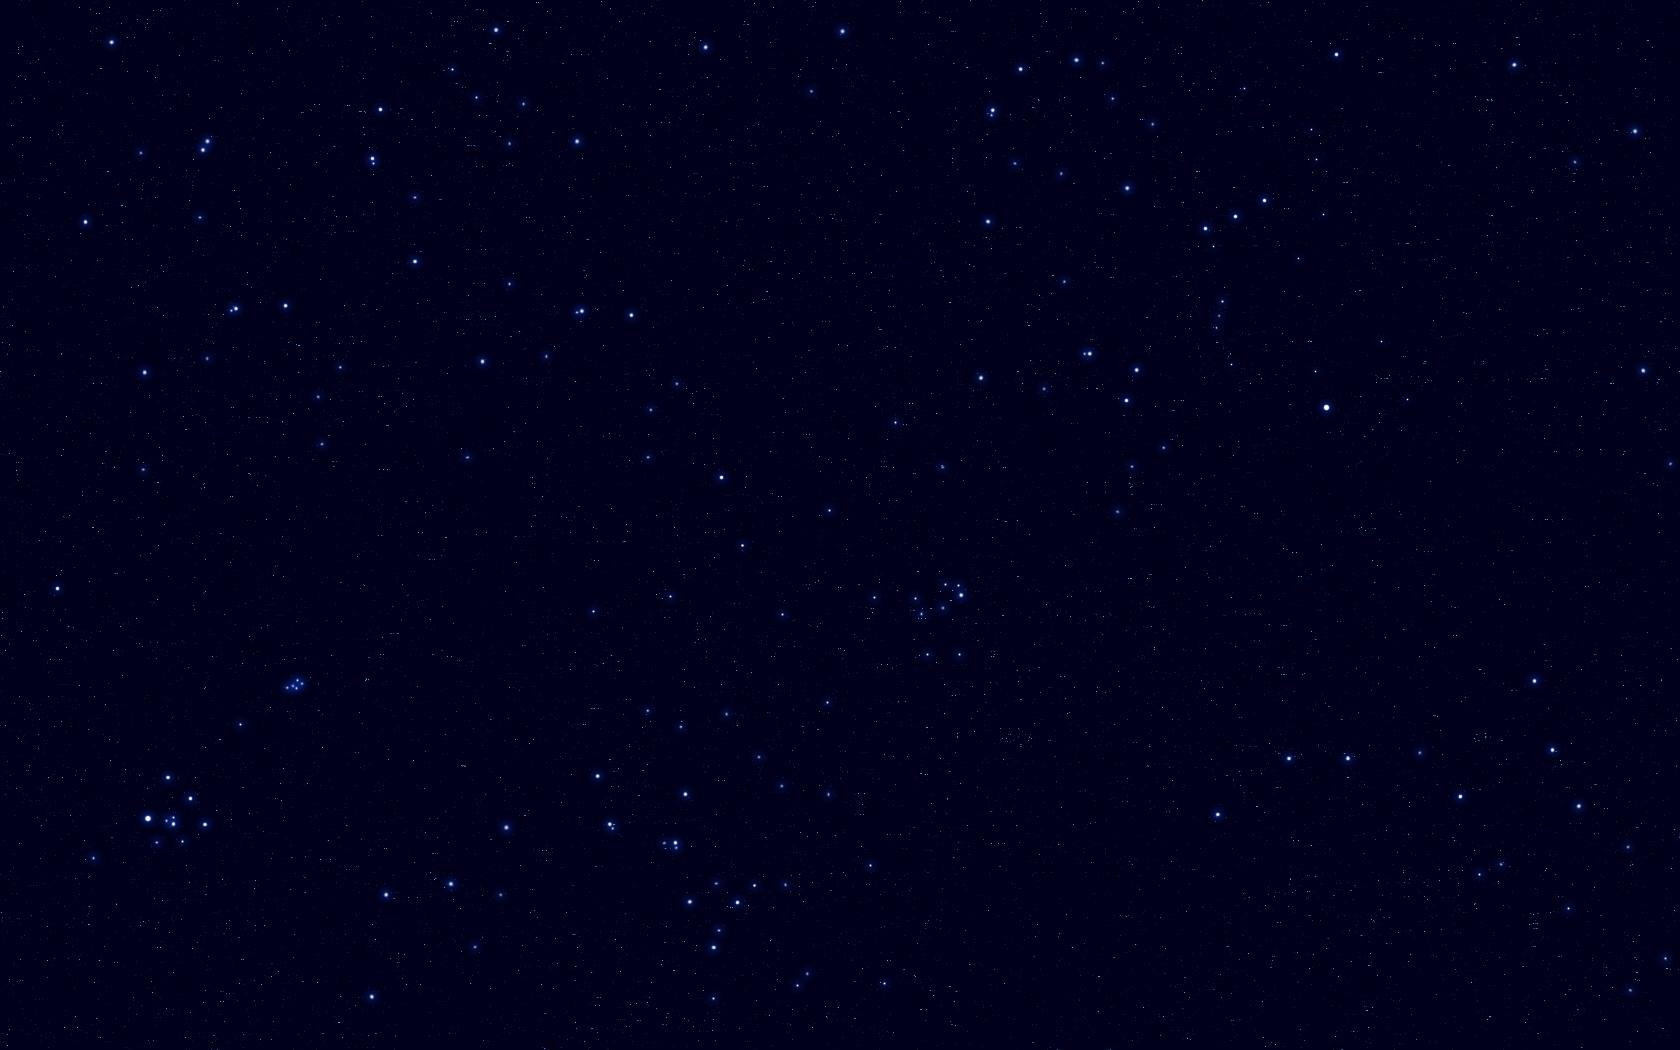 starry sky wallpaper dark